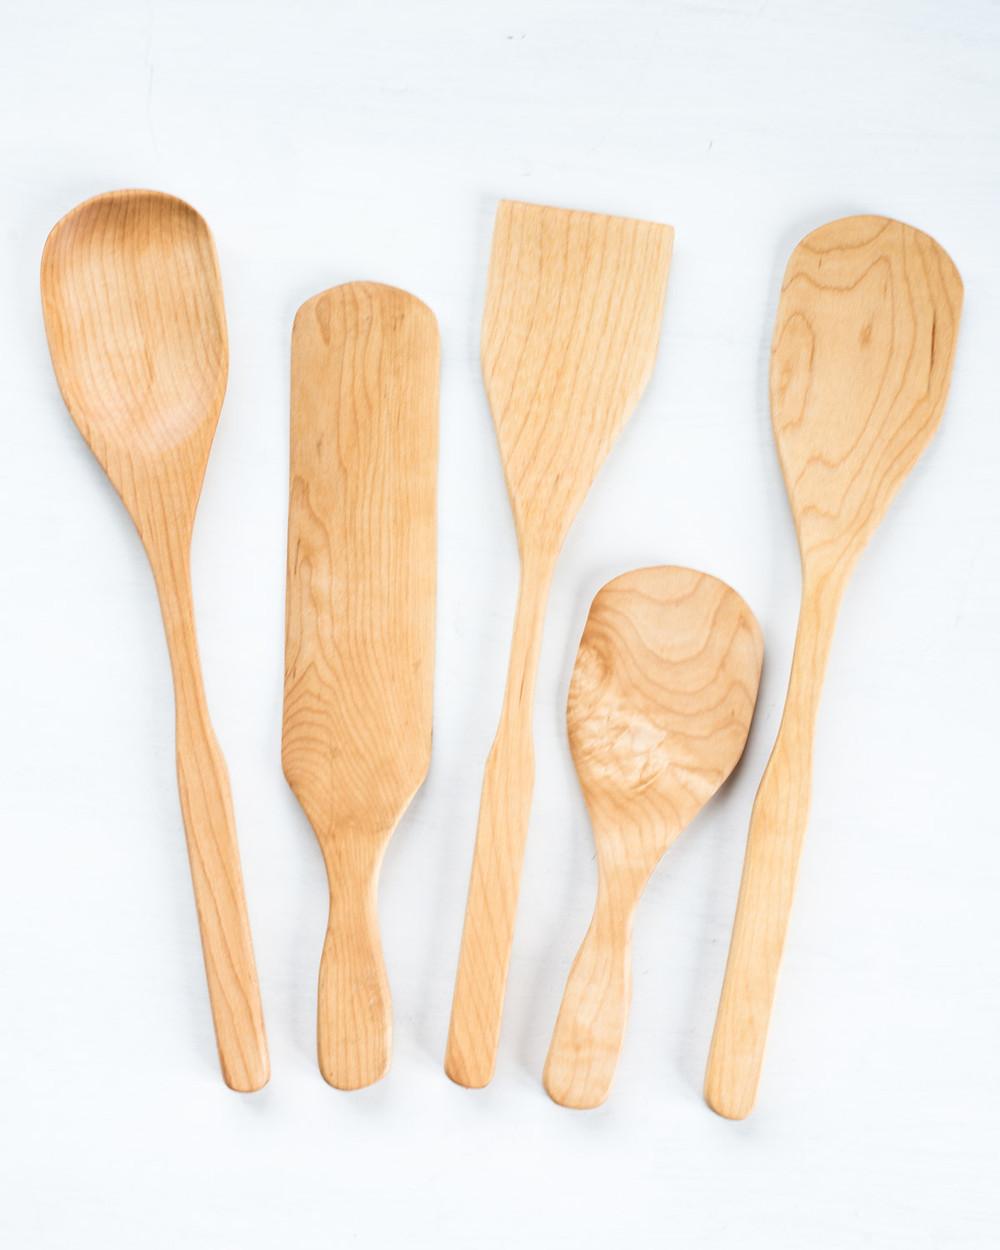 BoWood Company creates gorgeous wooden kitchen utensils